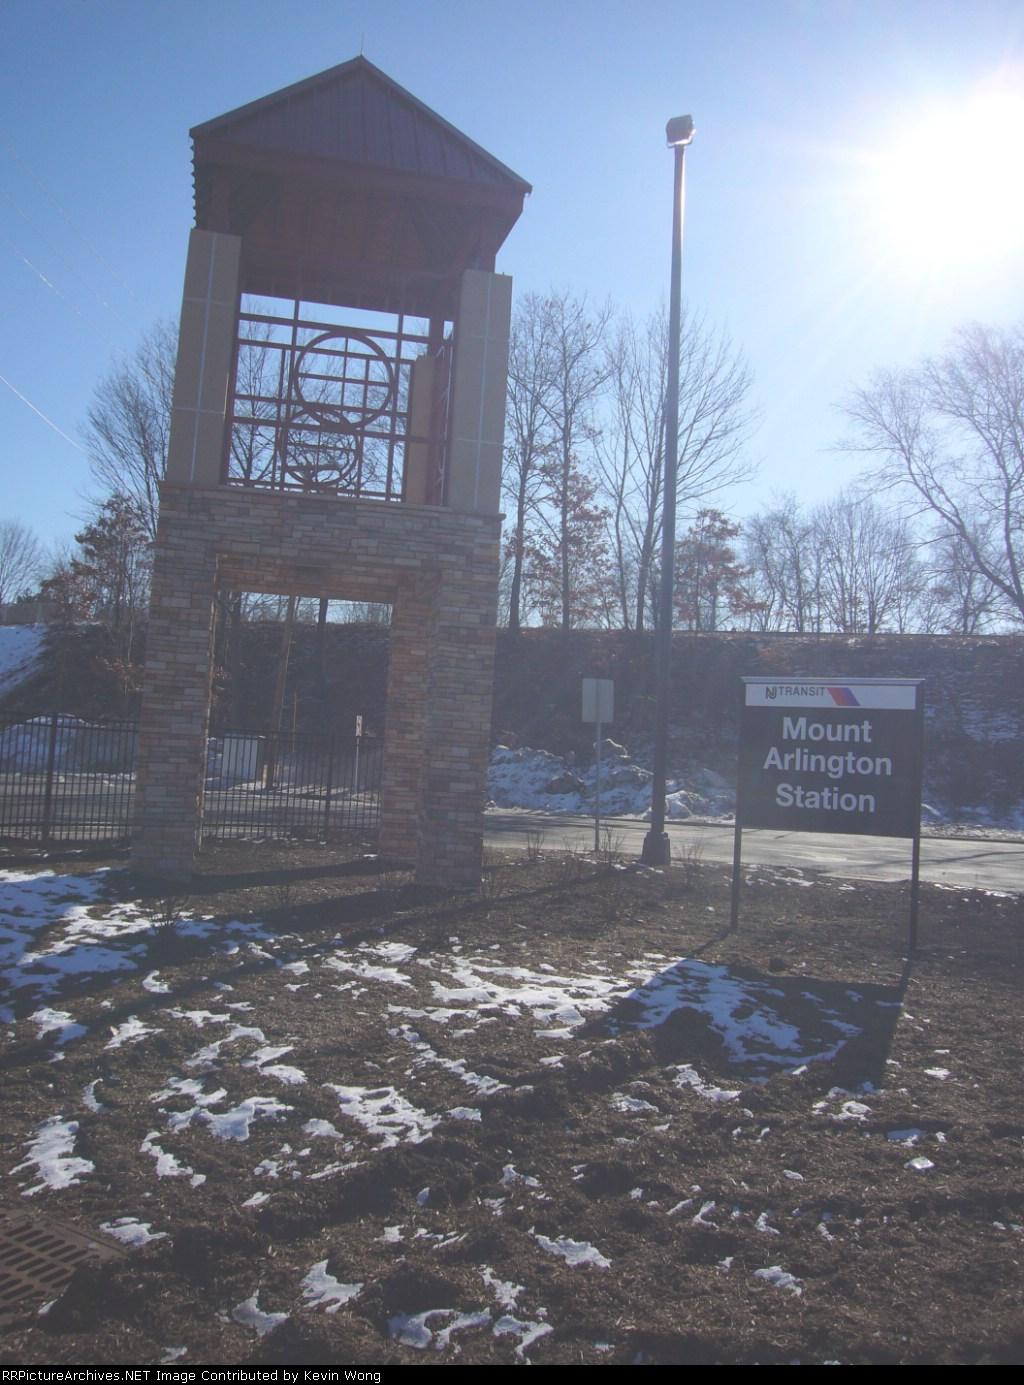 Mount Arlington station entrance